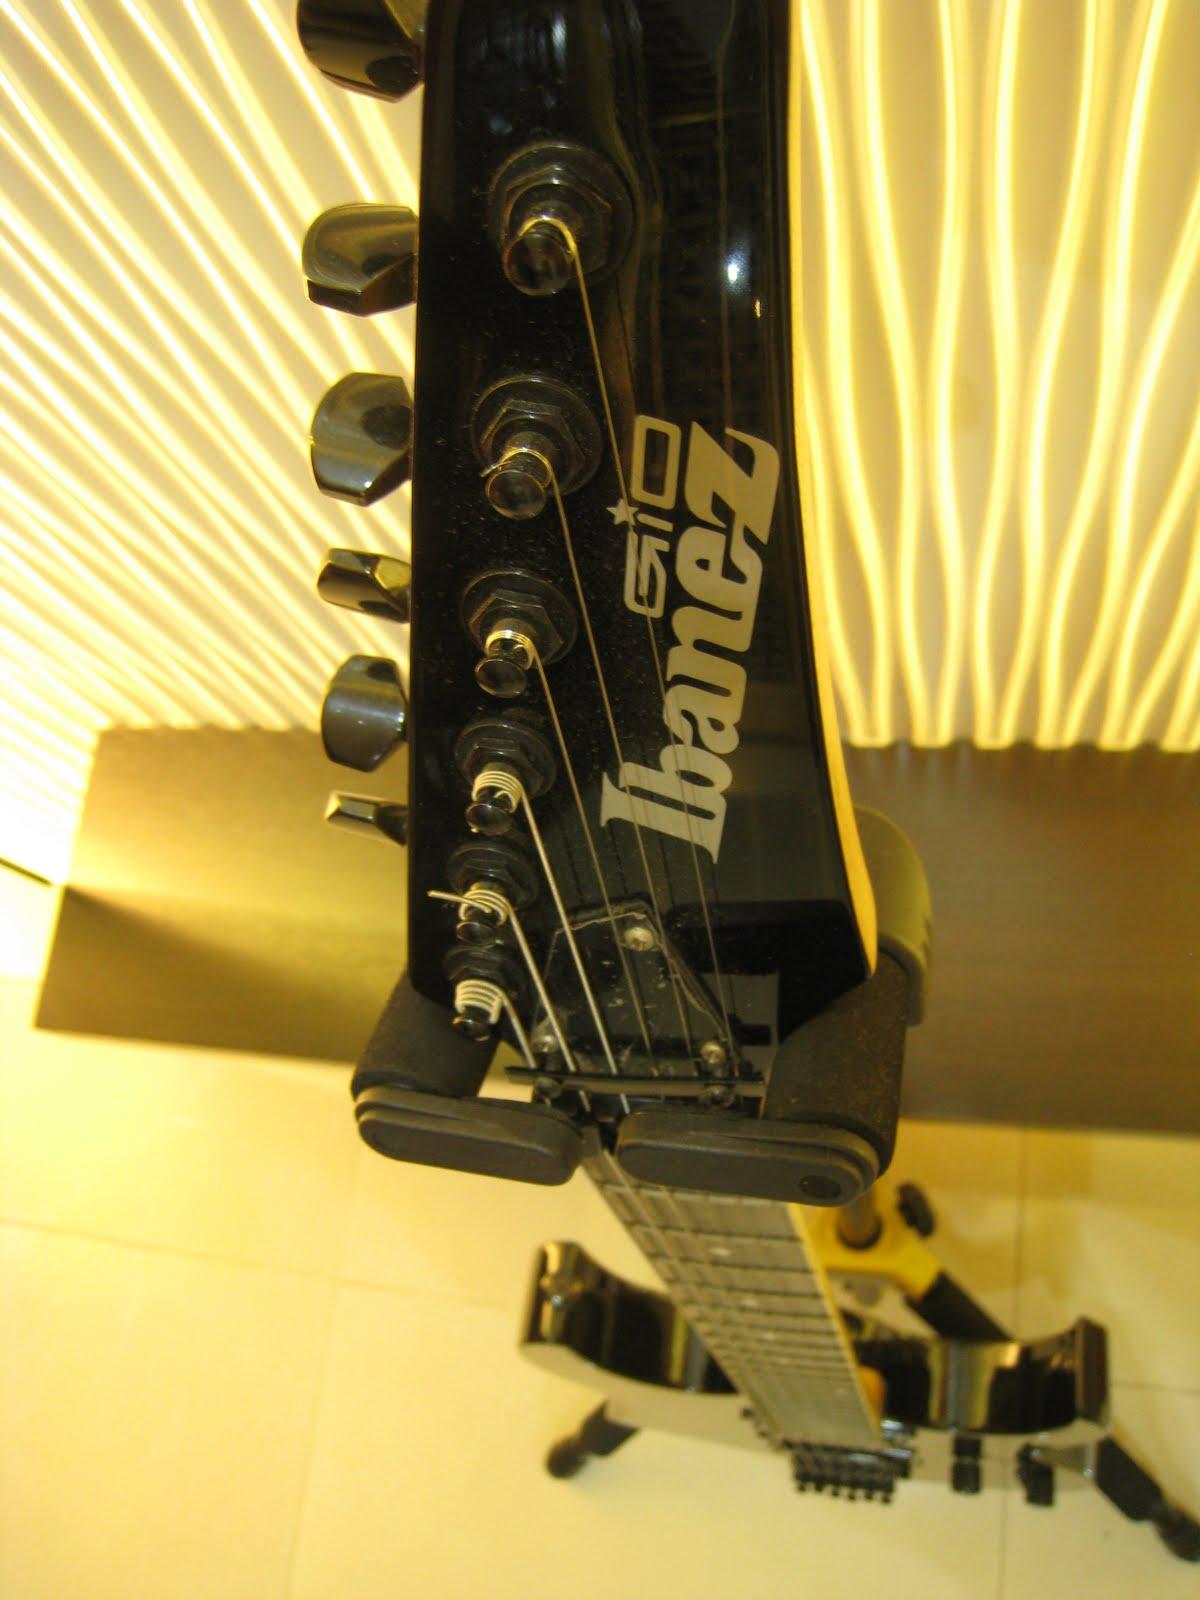 maximus guitars accessories ibanez grg270 second hand. Black Bedroom Furniture Sets. Home Design Ideas